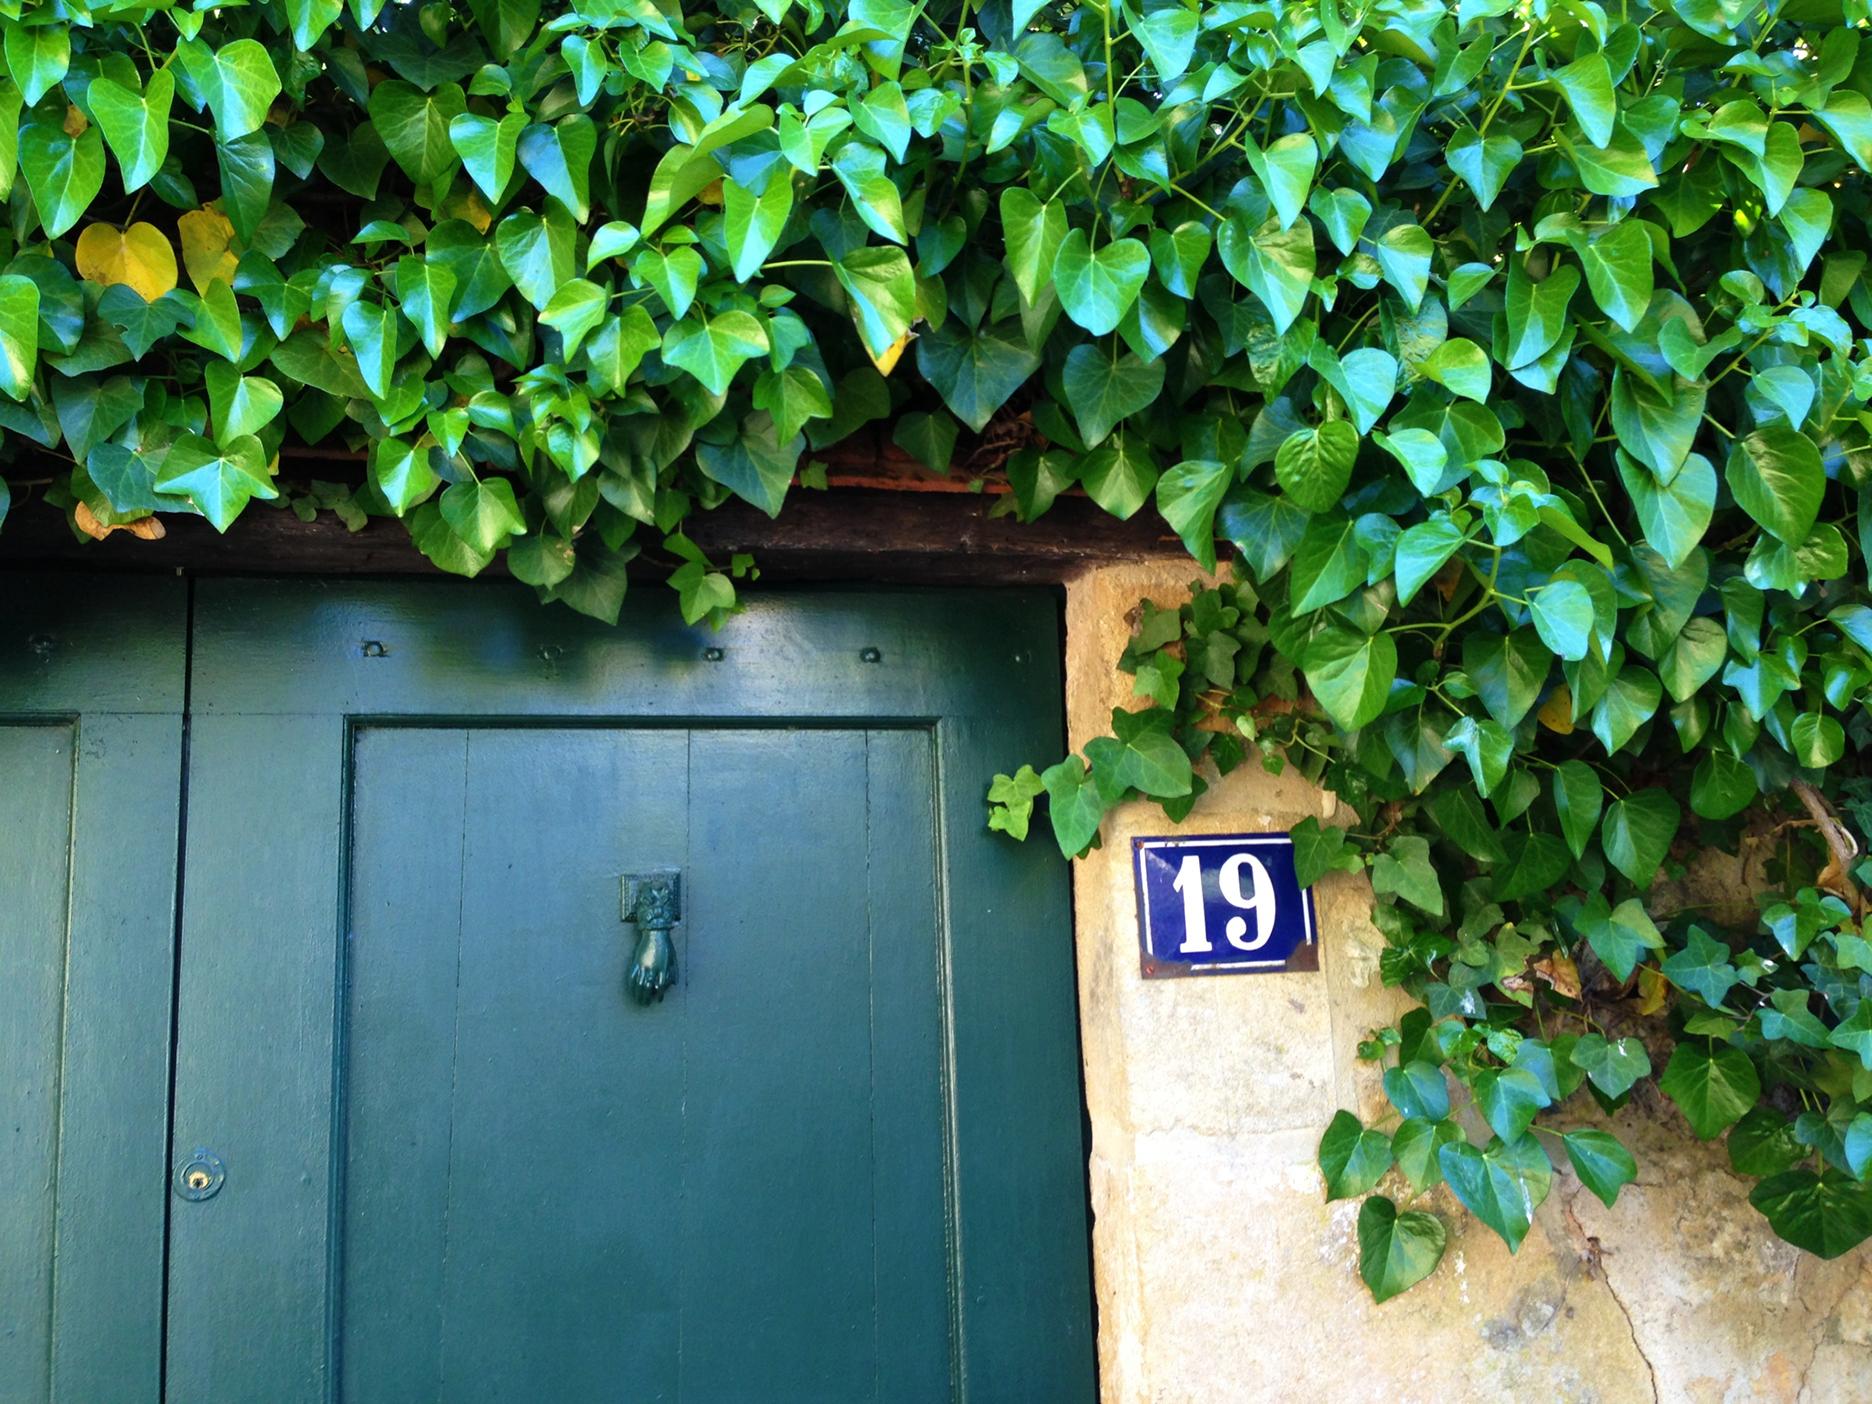 A good door knocker will dress up any ordinary door